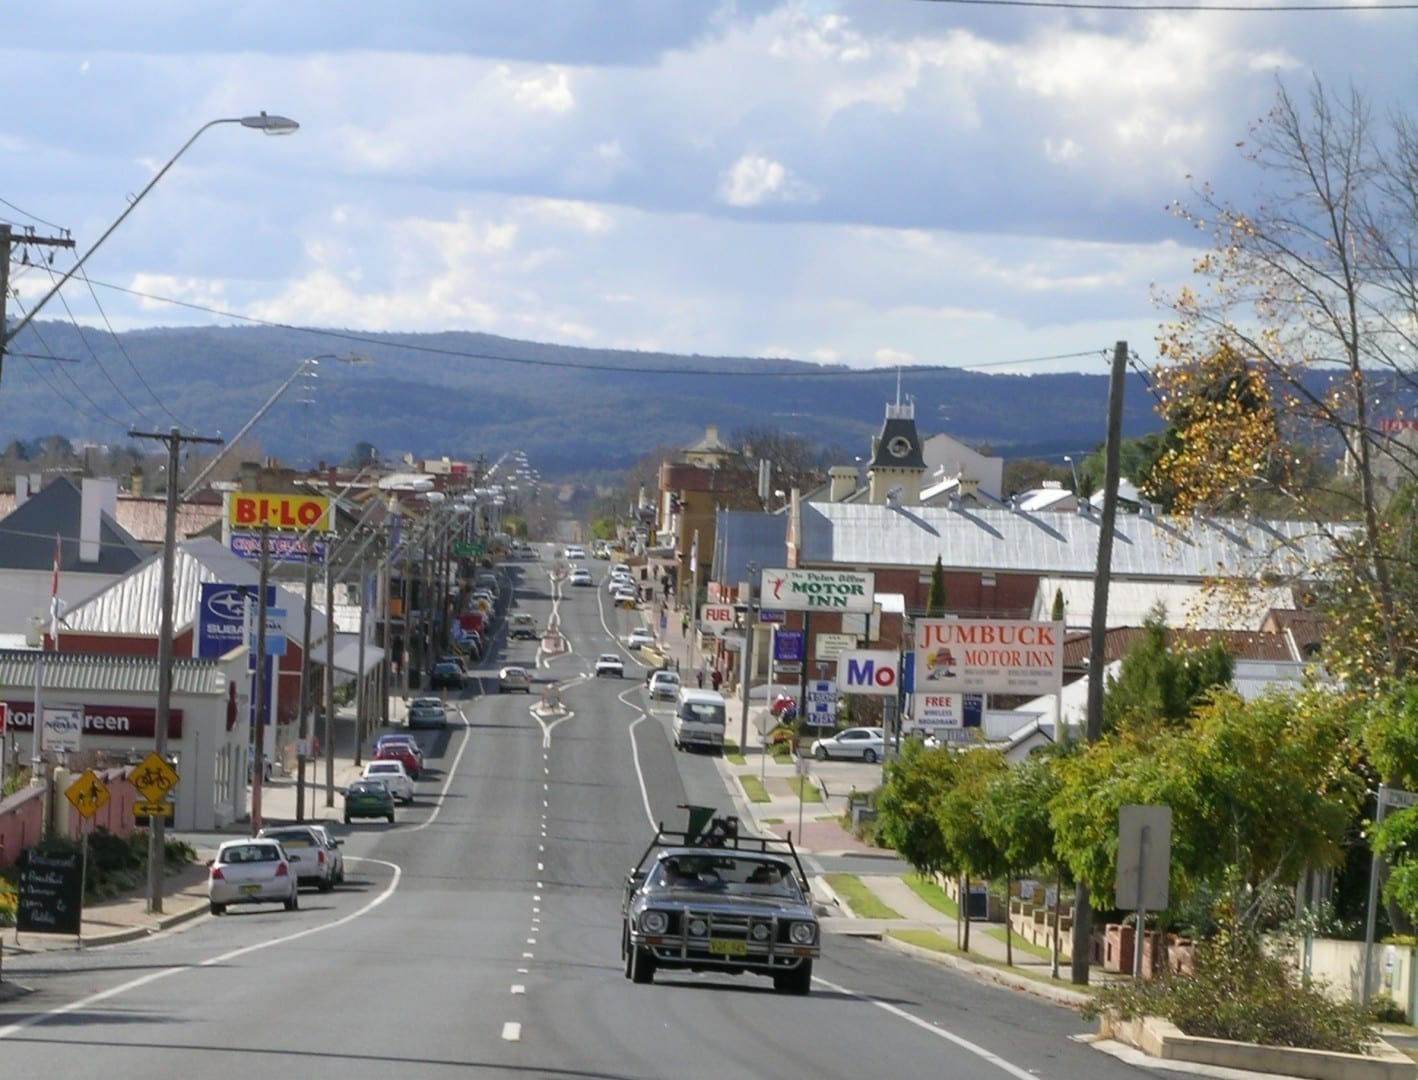 Autopista de Nueva Inglaterra, Tenterfield, NSW. Tenterfield Australia